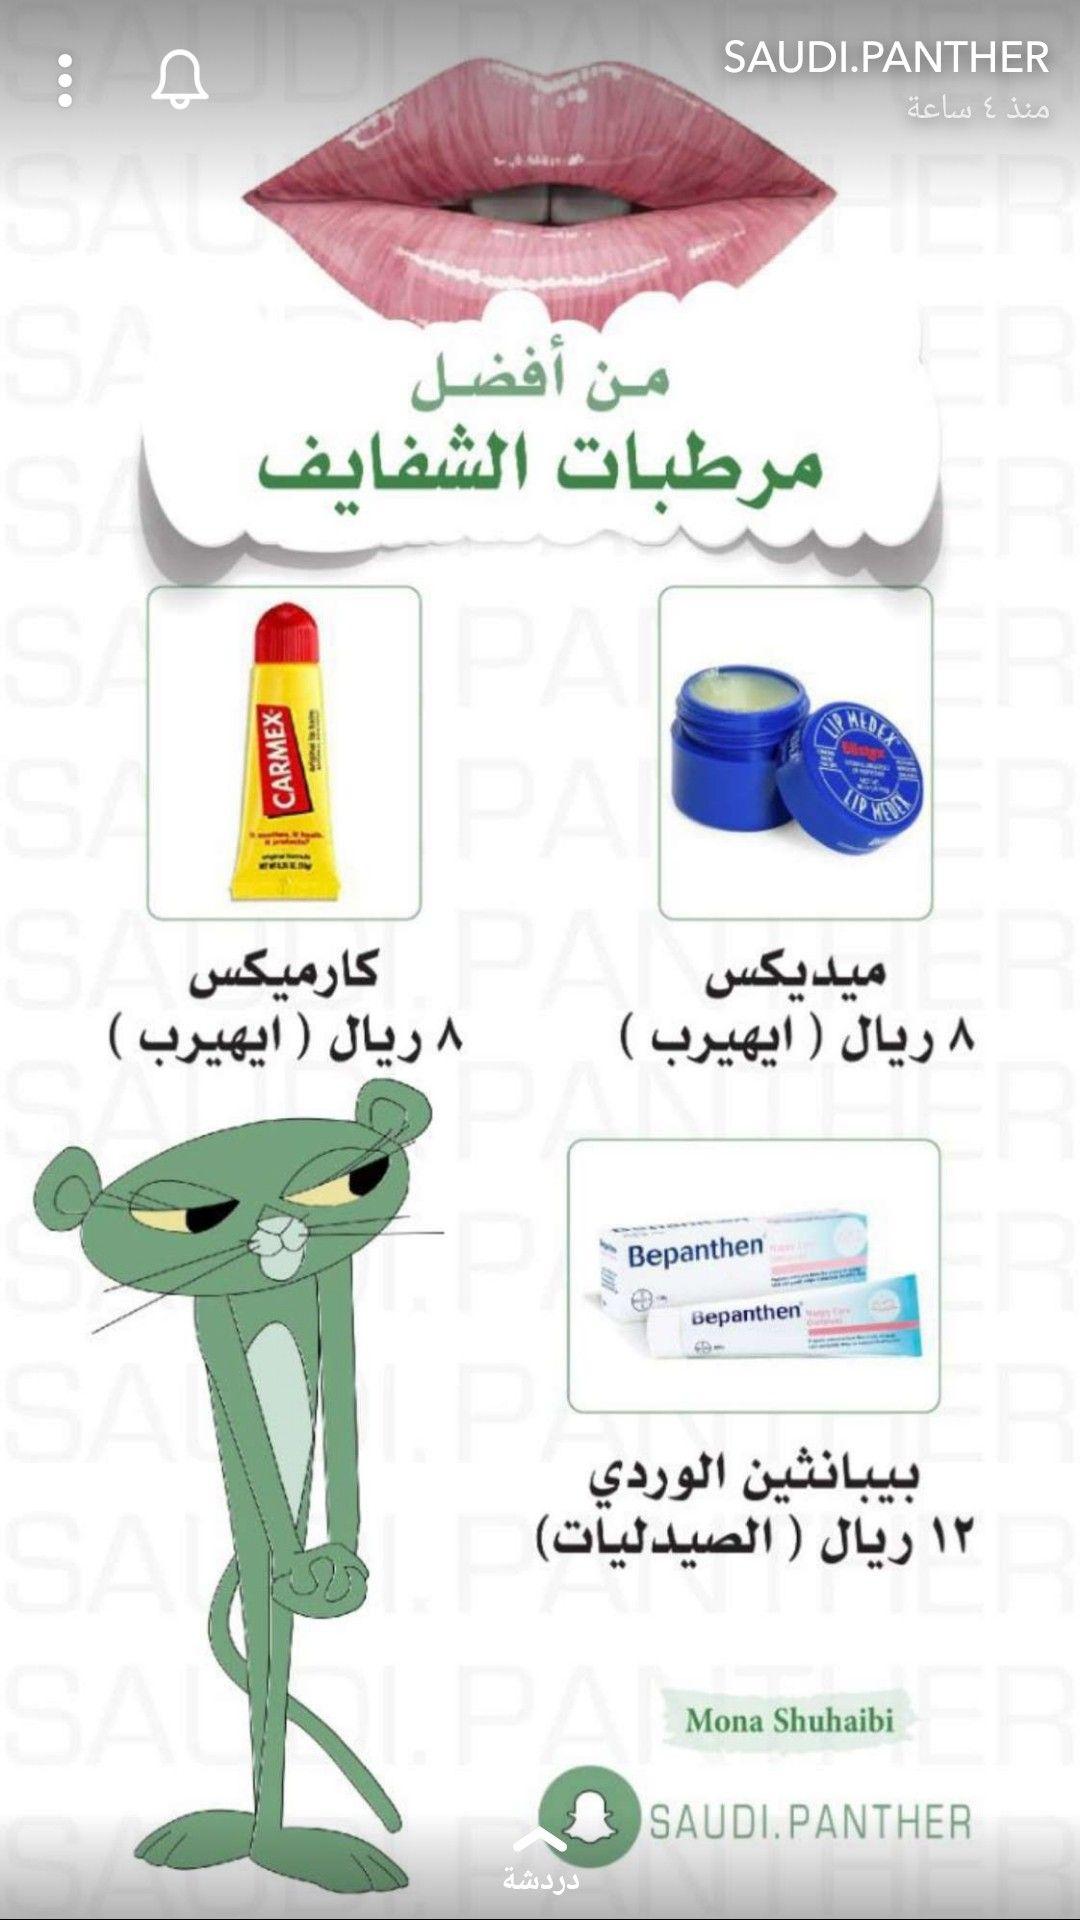 Pin By Ro7ry On كريمات و قطرات و غسولات وكل مايخص البشرة Beauty Skin Care Routine Beauty Skin Care Beauty Hacks